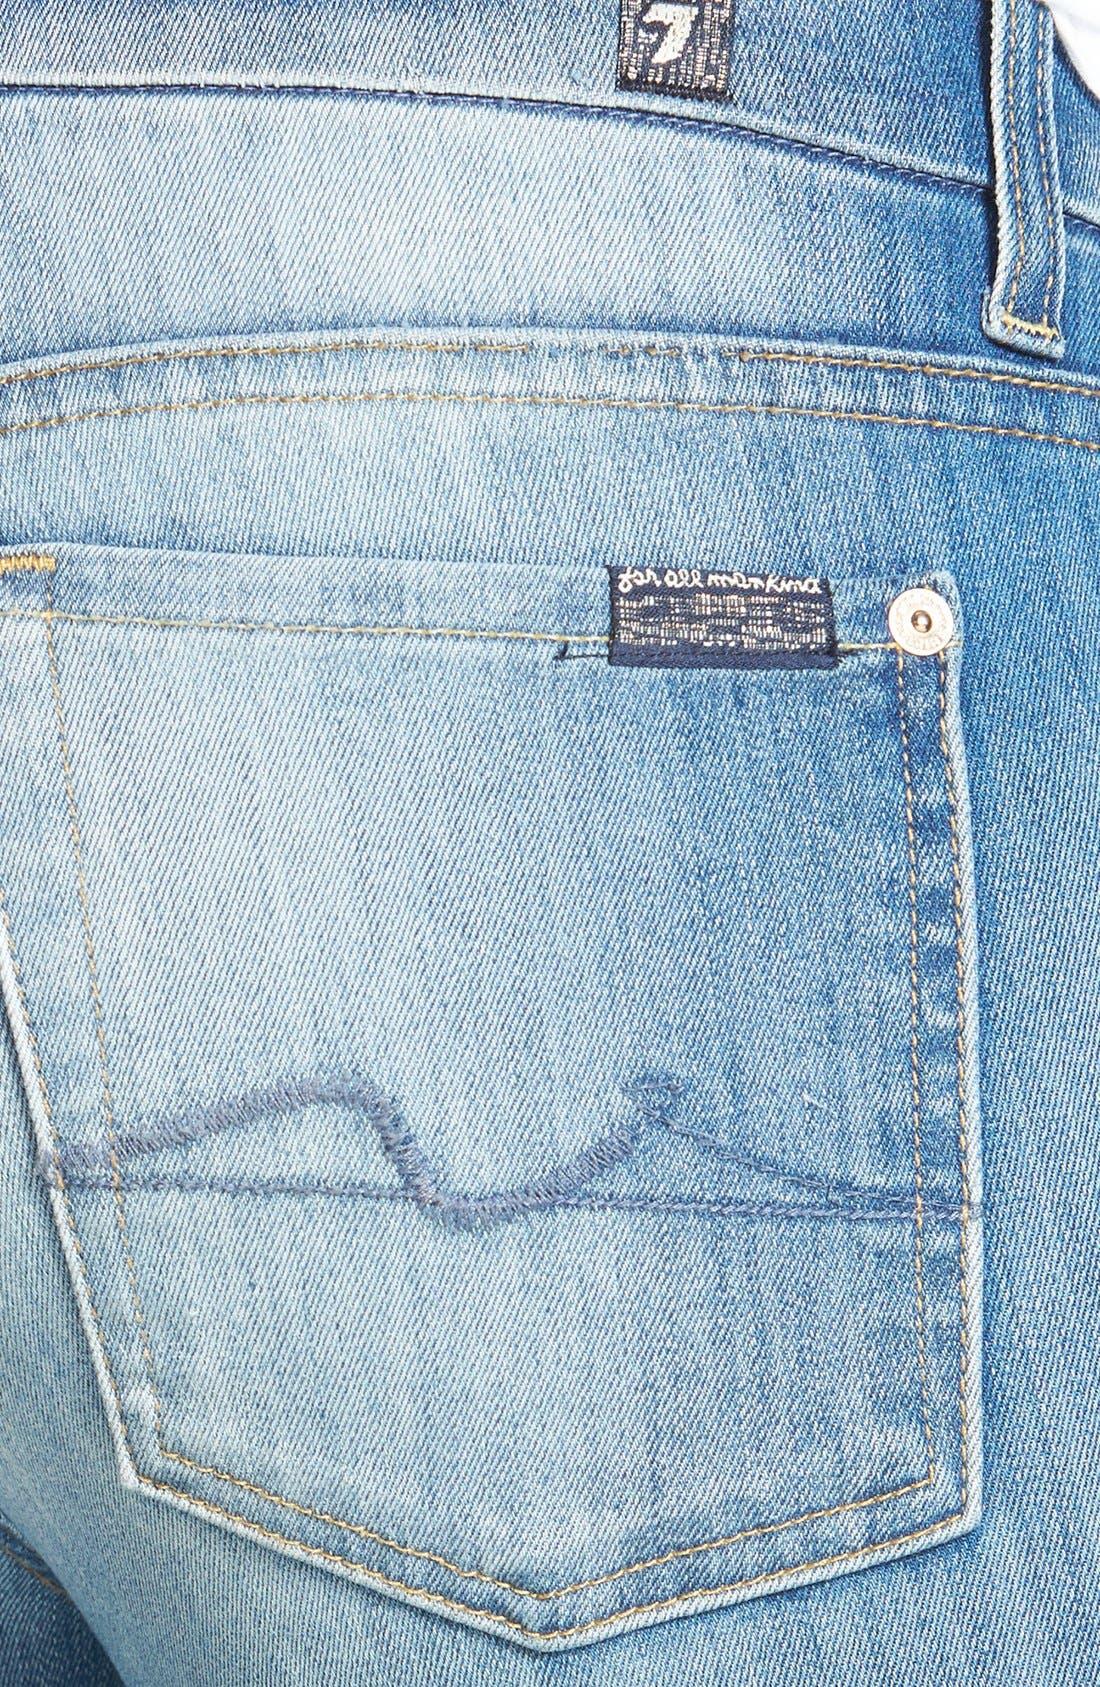 Alternate Image 3  - 7 For All Mankind® 'Kimmie' Crop Skinny Jeans (Light Cobalt Blue)